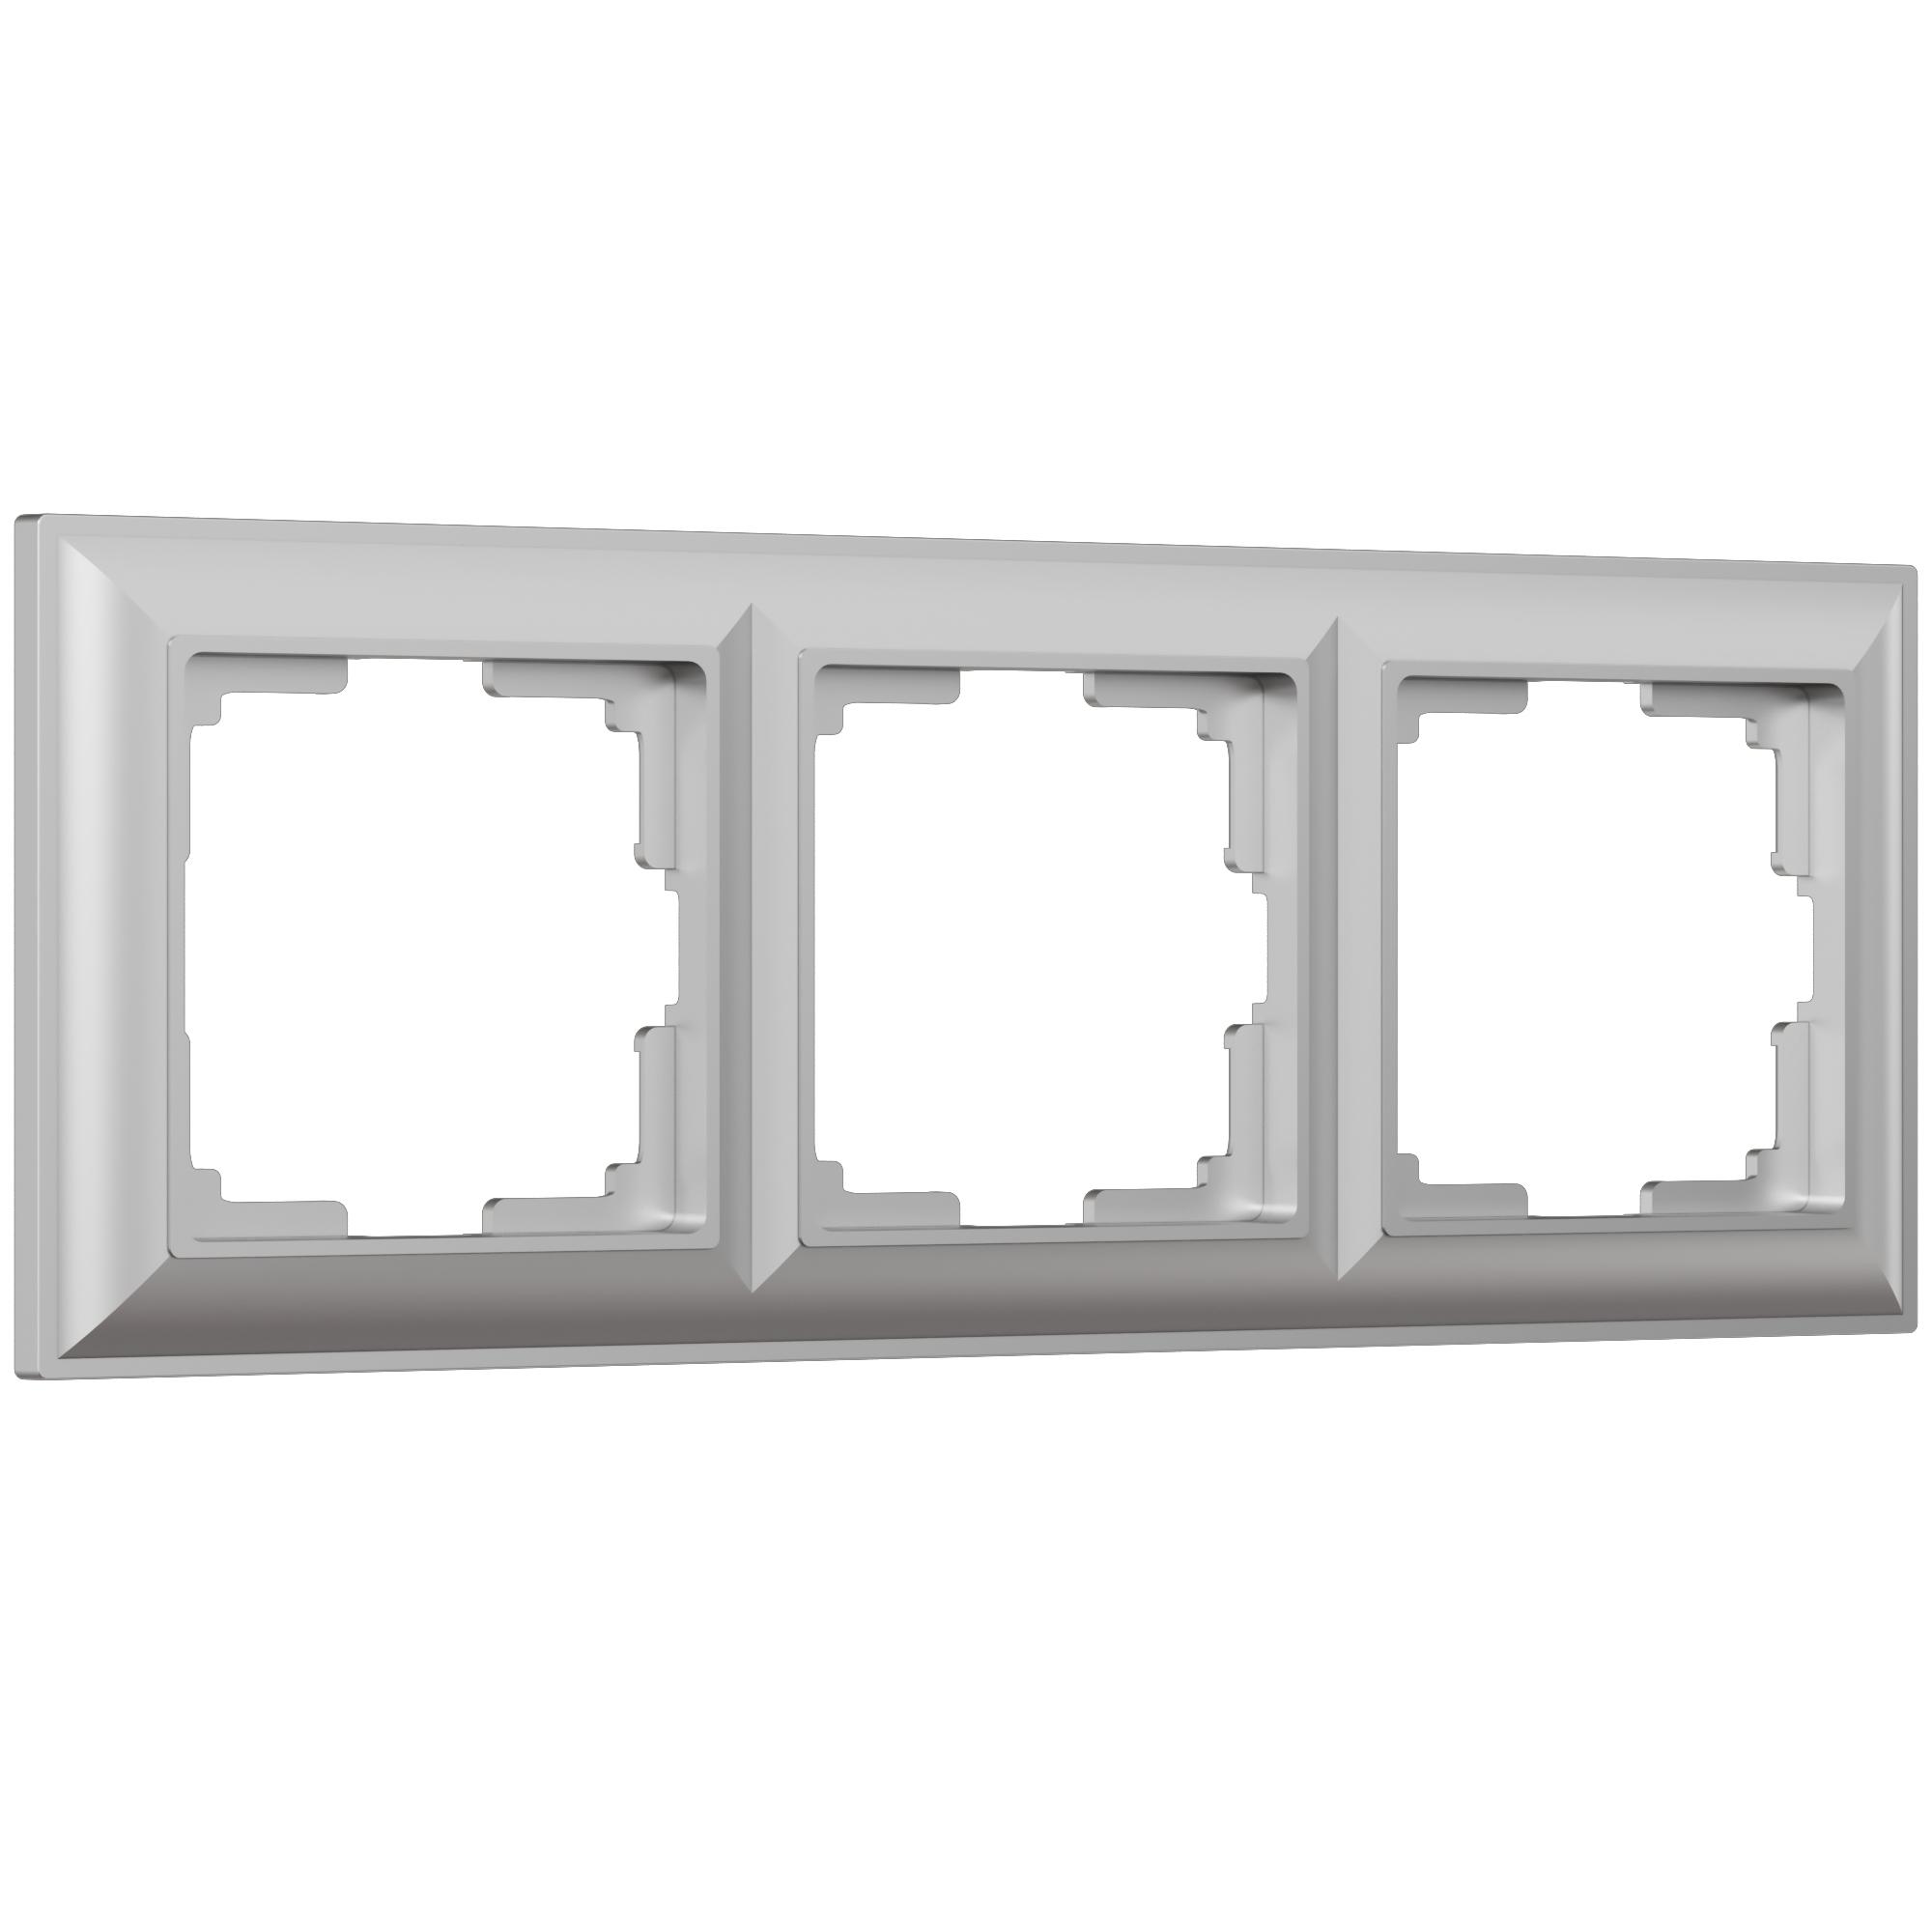 Рамка на 3 поста (серебряный) W0032206